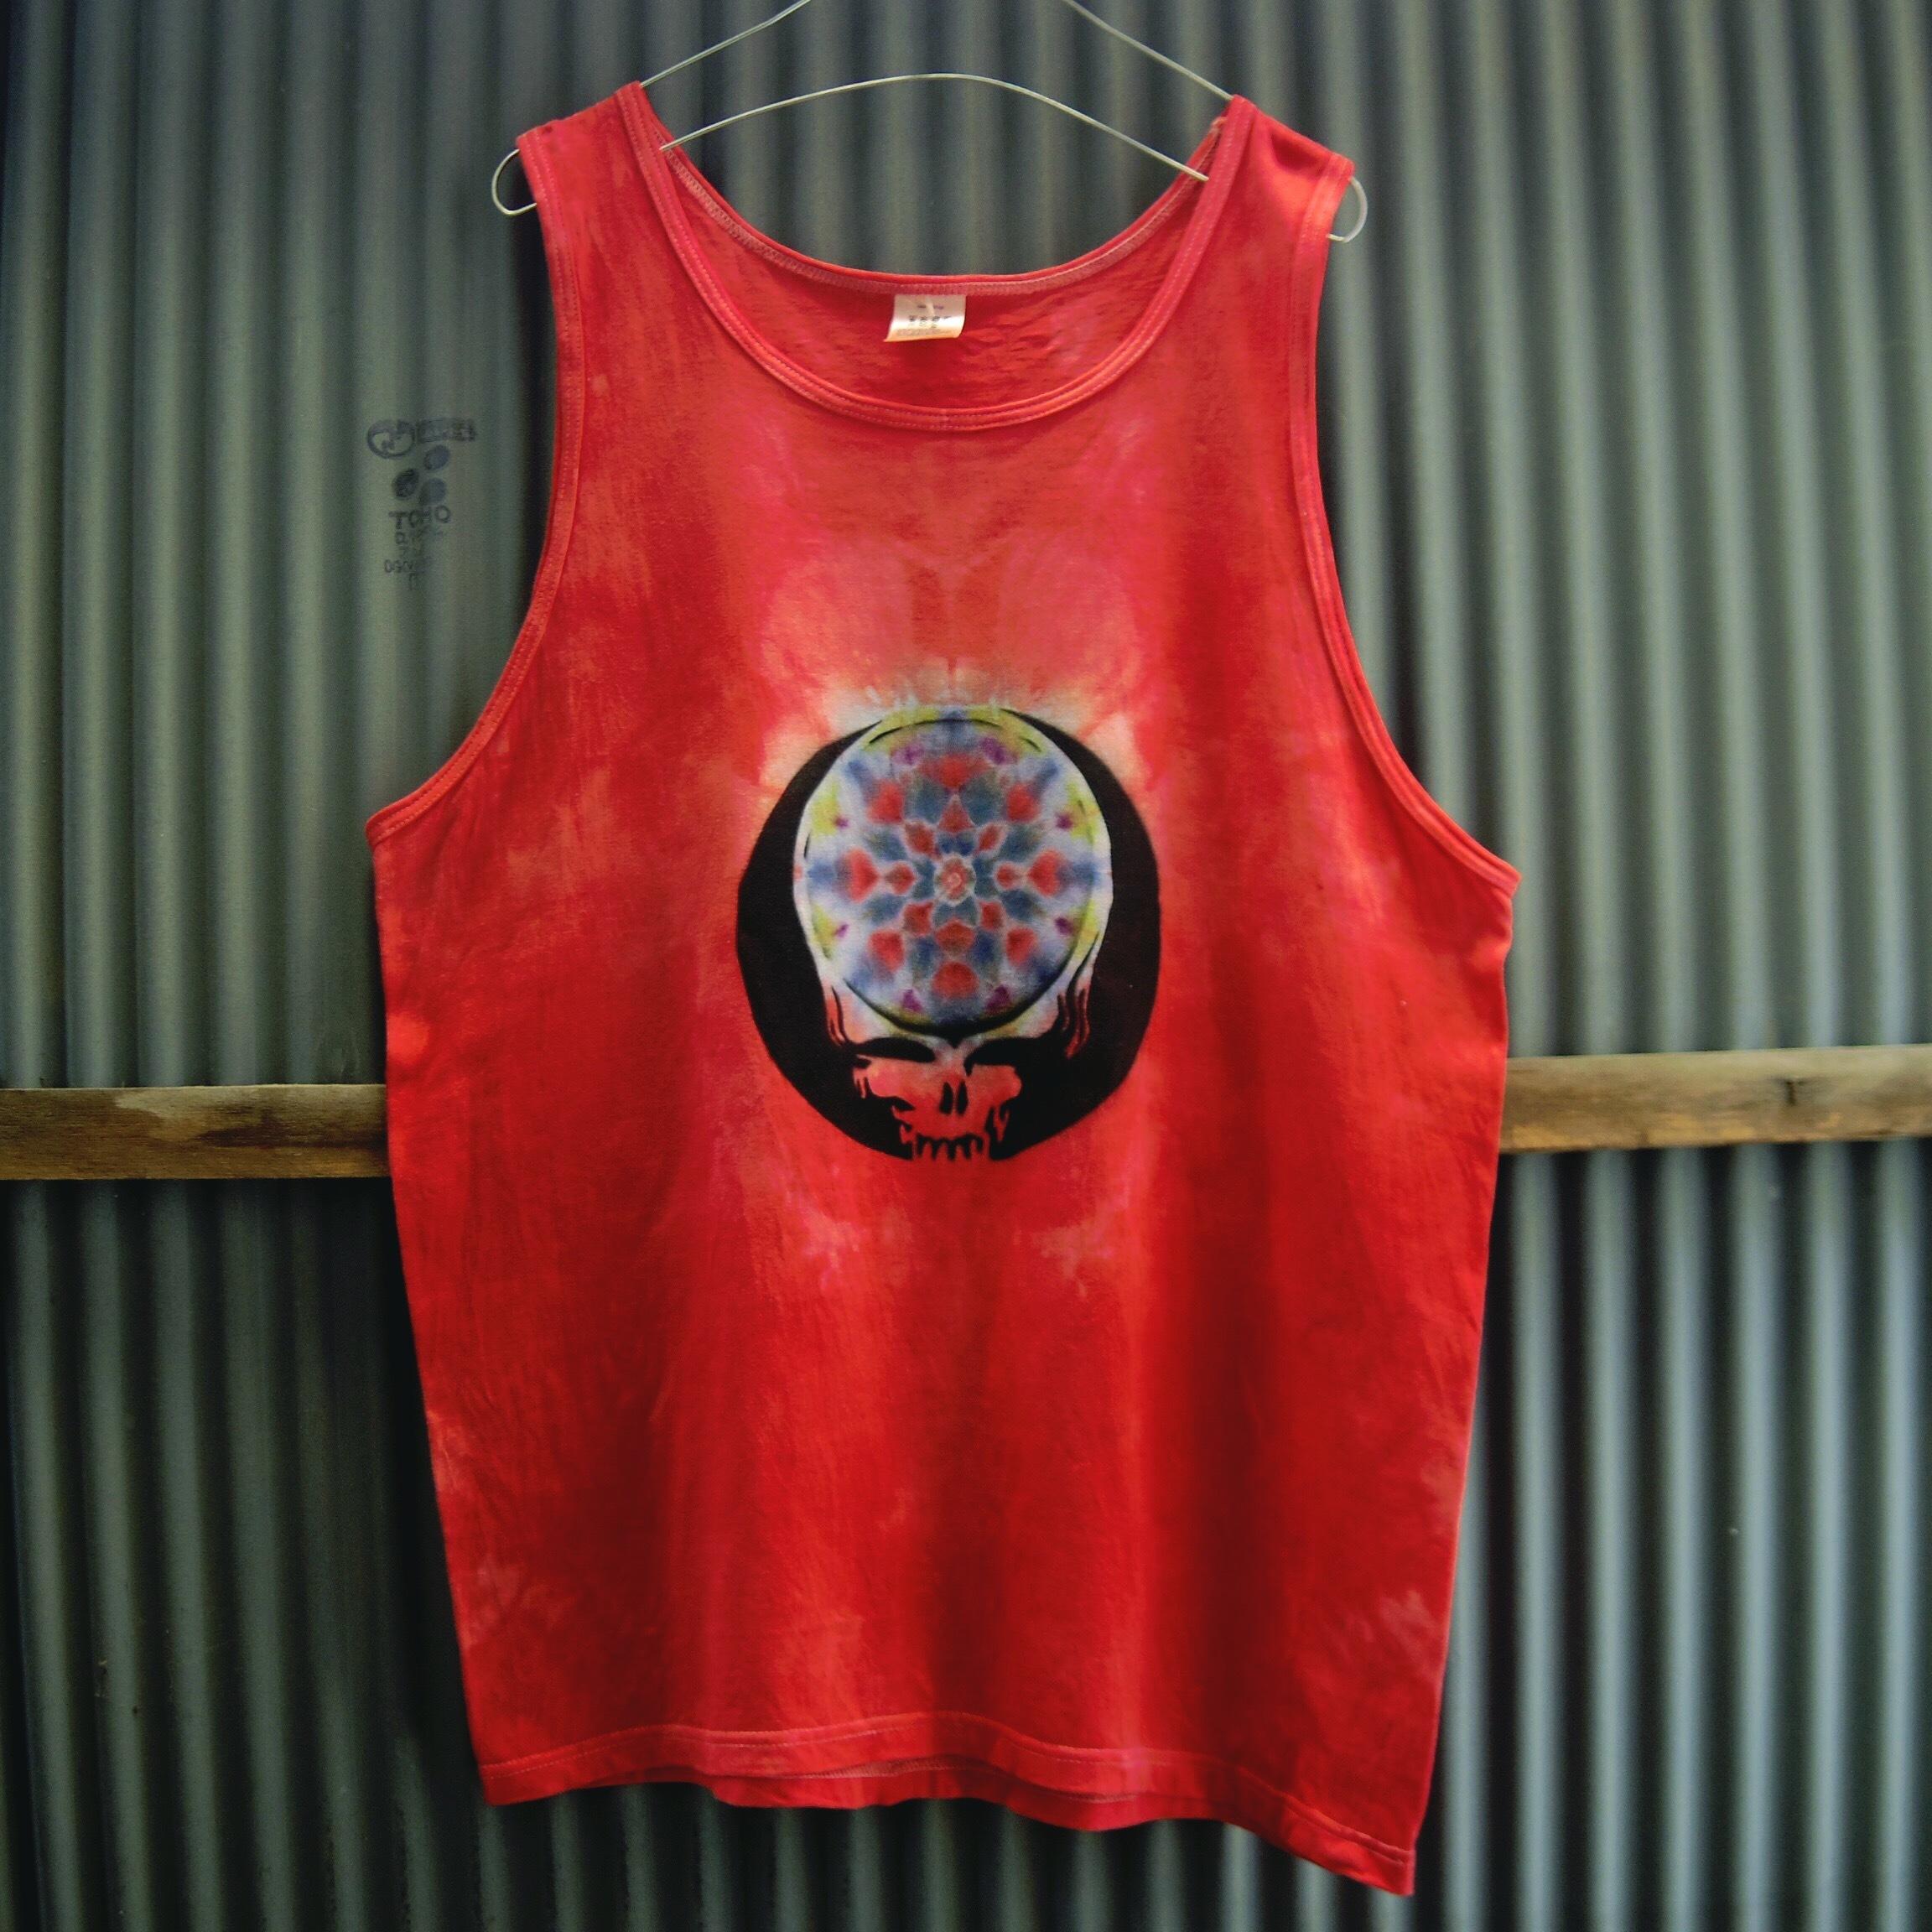 TKHOME FACTORY×GRATEFUL DEAD SYF Mandala dyeing tank top Lsize